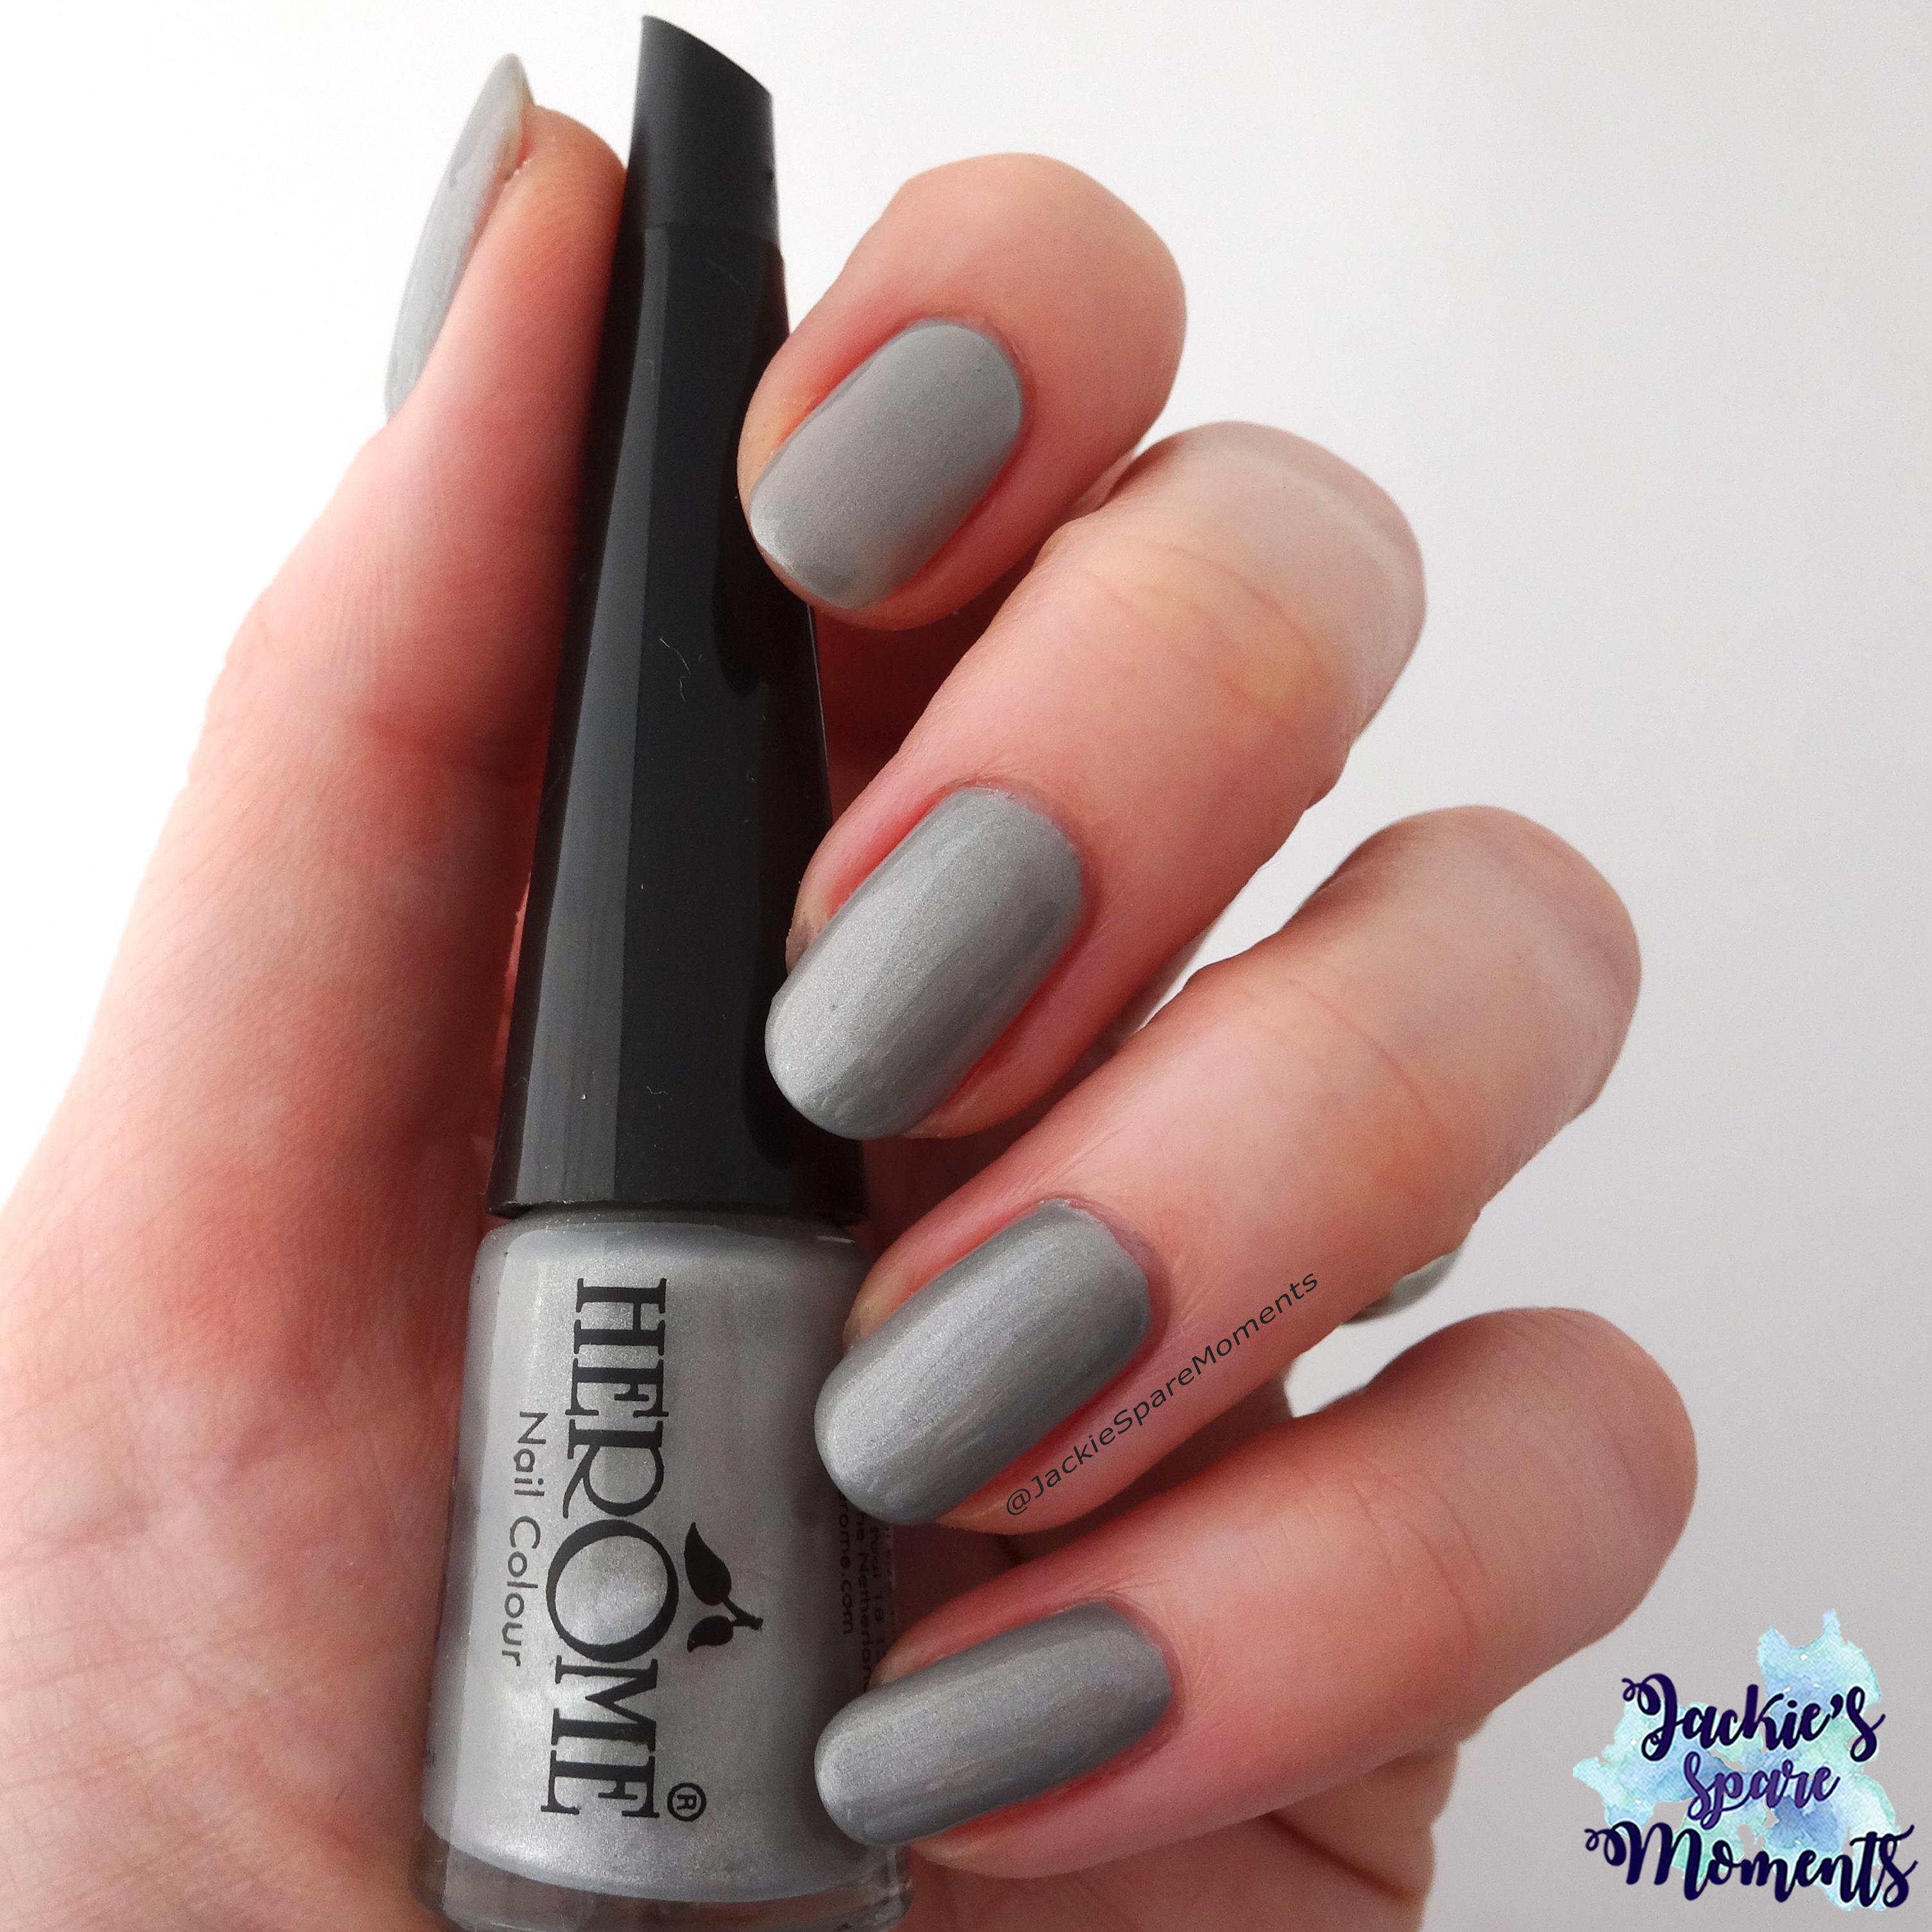 Herome Nail Colour nr 65 as Pantone Quiet Gray